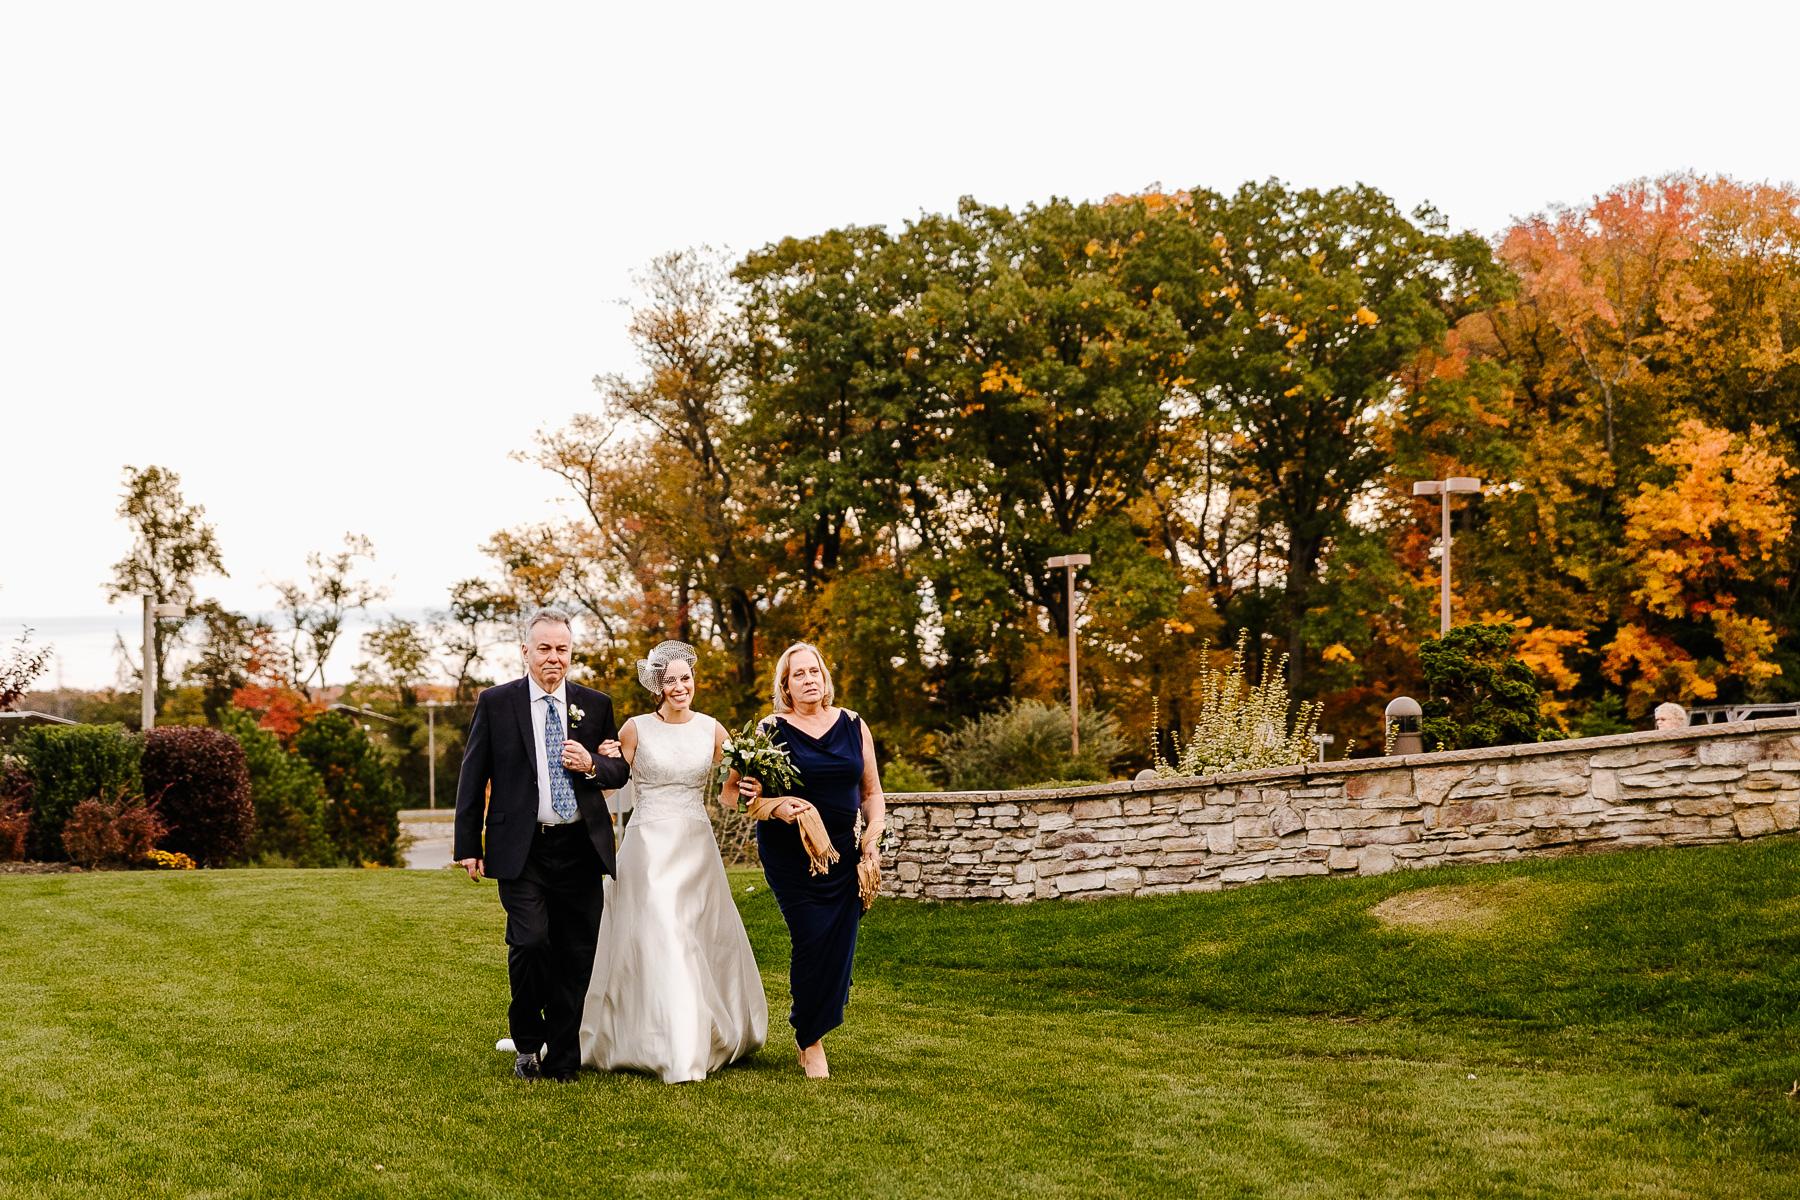 77-Laurita Winery Wedding New Jersey Wedding Photographer Laurita Winery Weddings Longbrook Photography.jpg